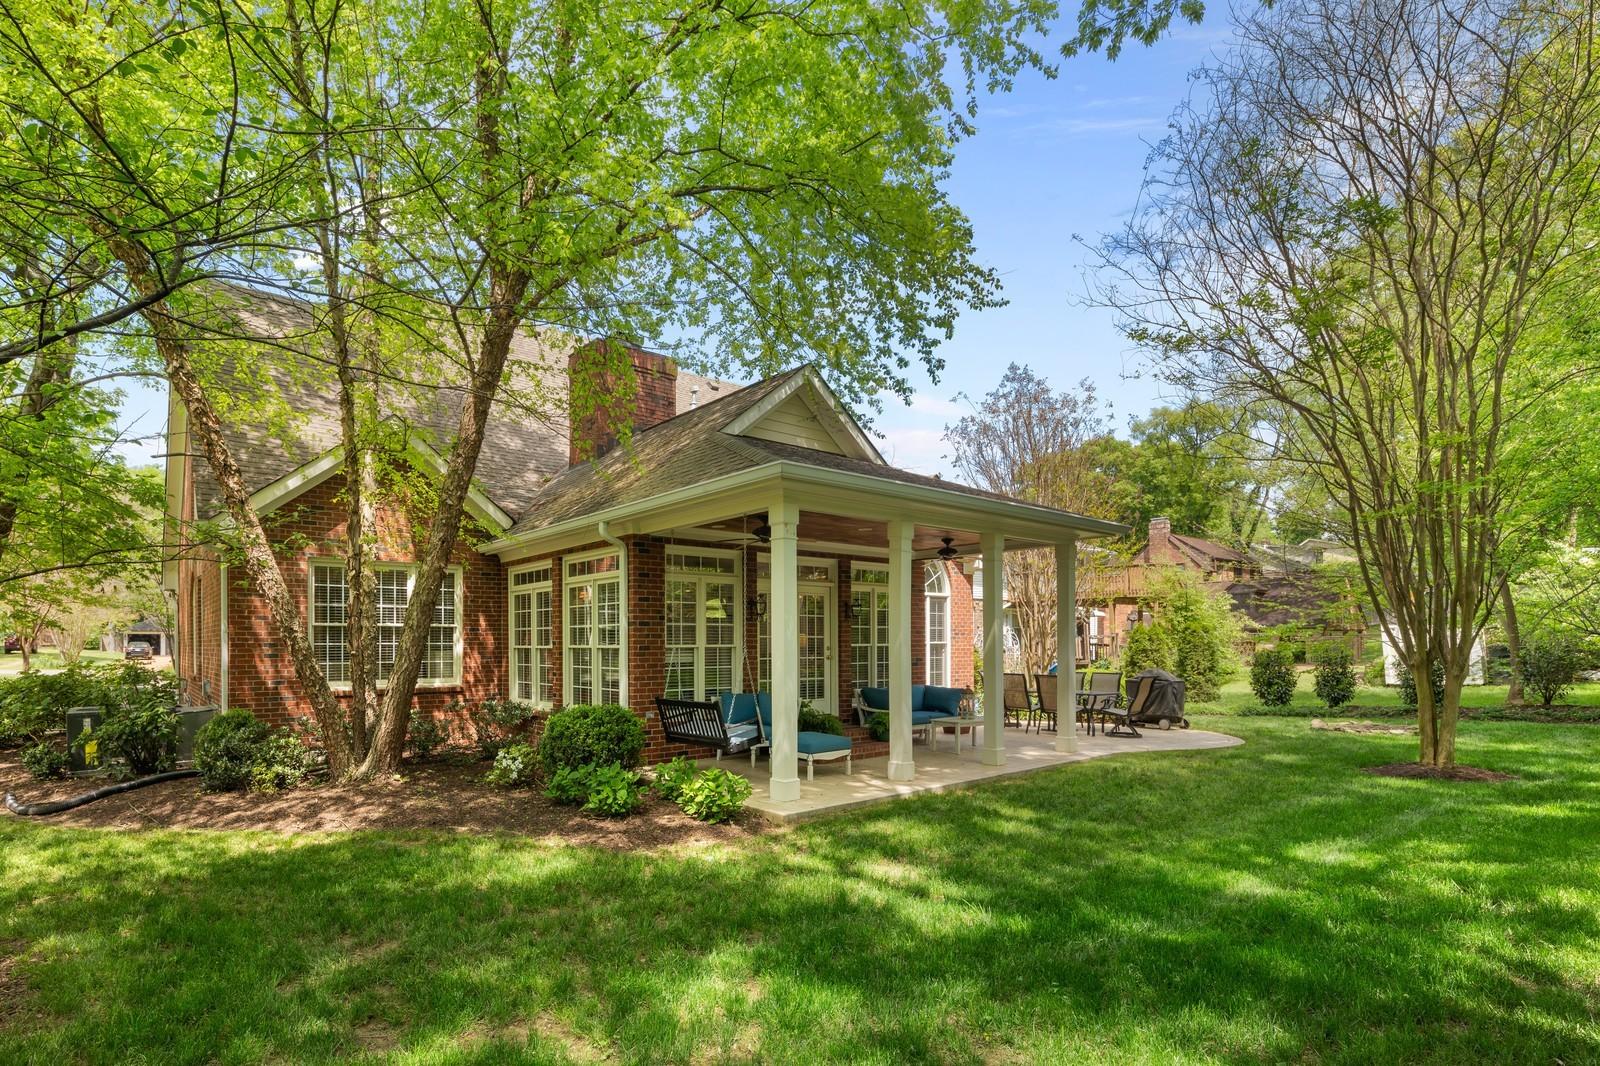 1111 Frances Ave Property Photo - Nashville, TN real estate listing